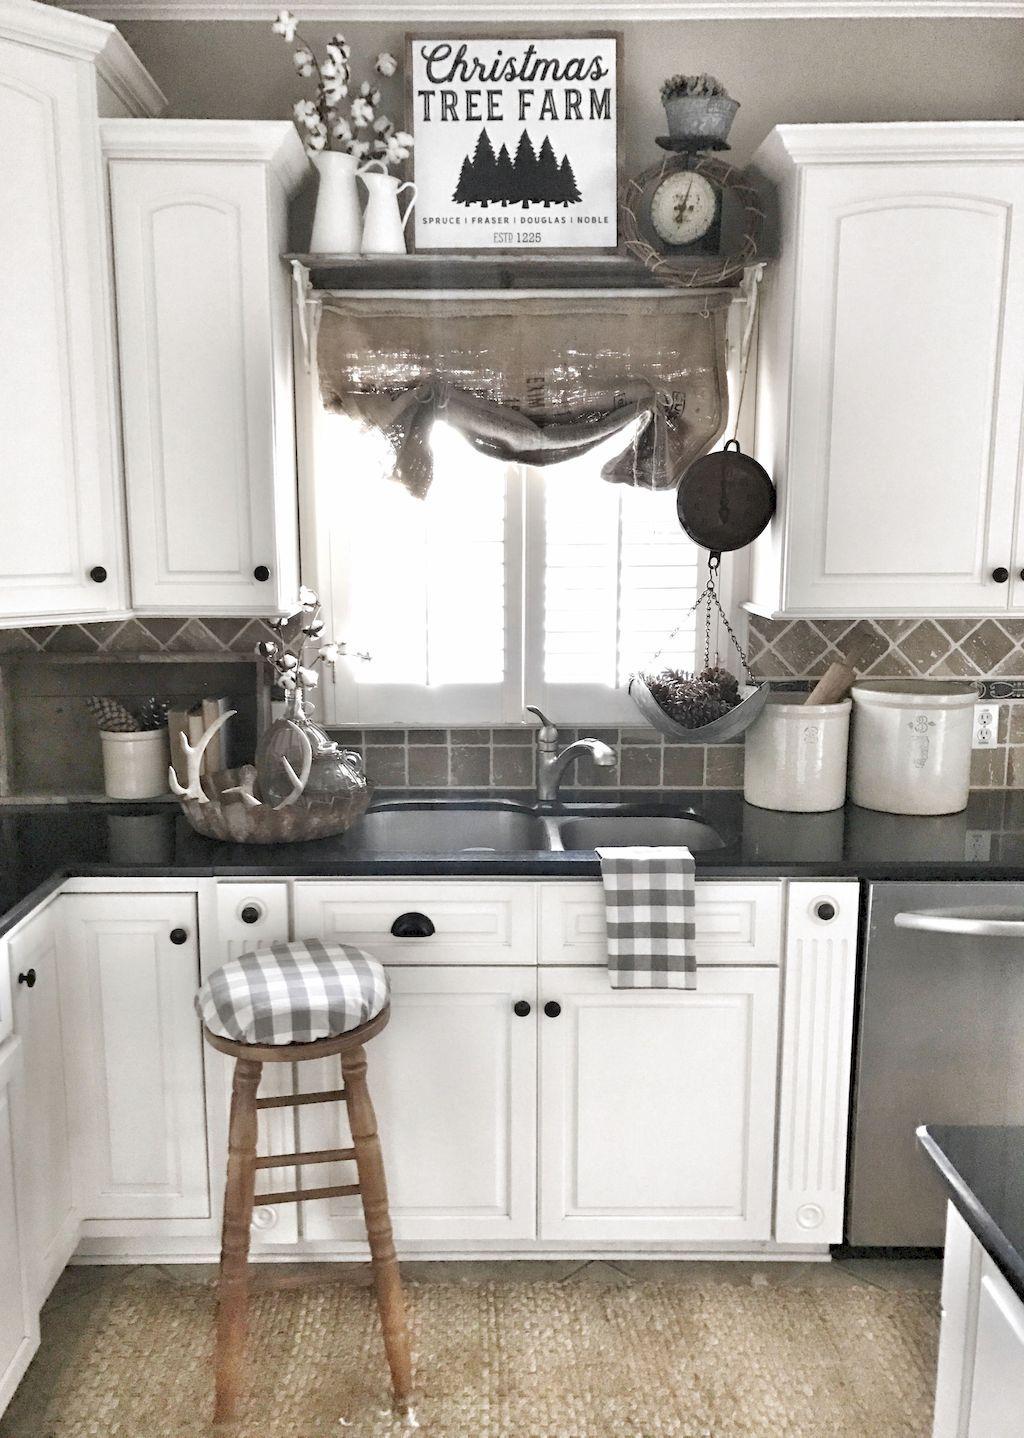 Gorgeous 50 Farmhouse Kitchen Cabinets Decorating Ideas On A Budget Https Carribeanpic Farmhouse Kitchen Decor Kitchen Cabinets Decor Antique White Kitchen